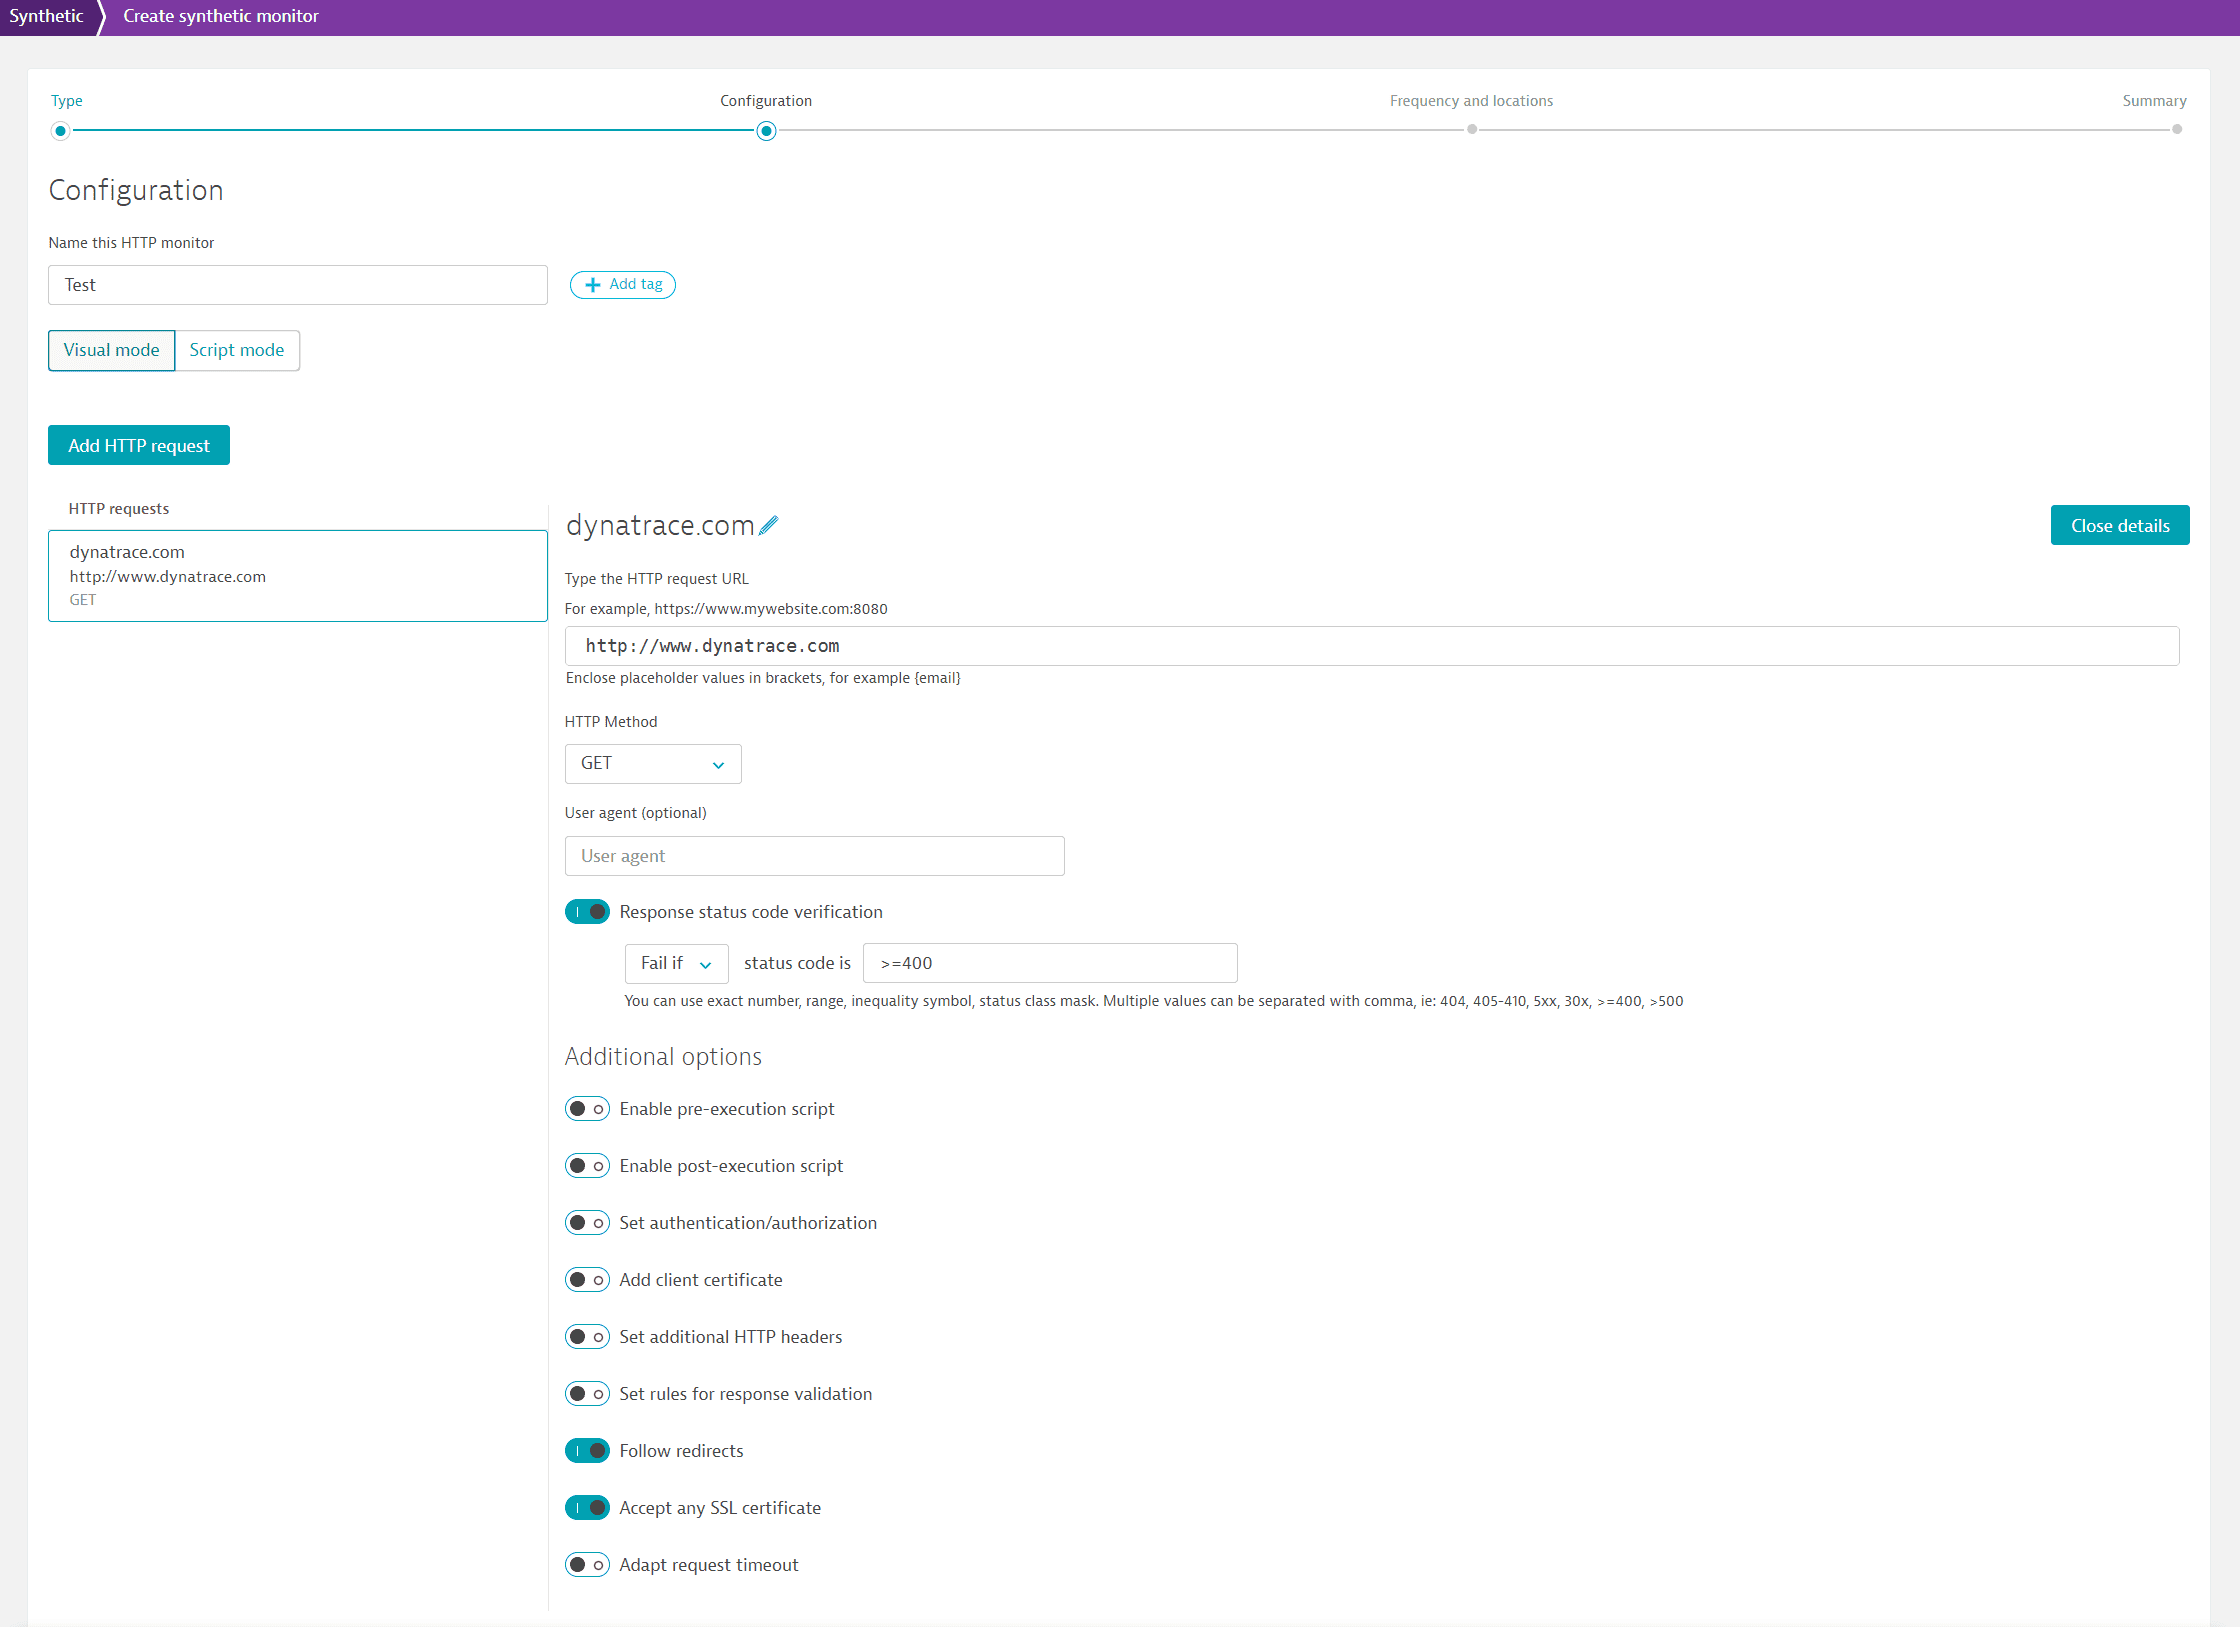 Expanded request details